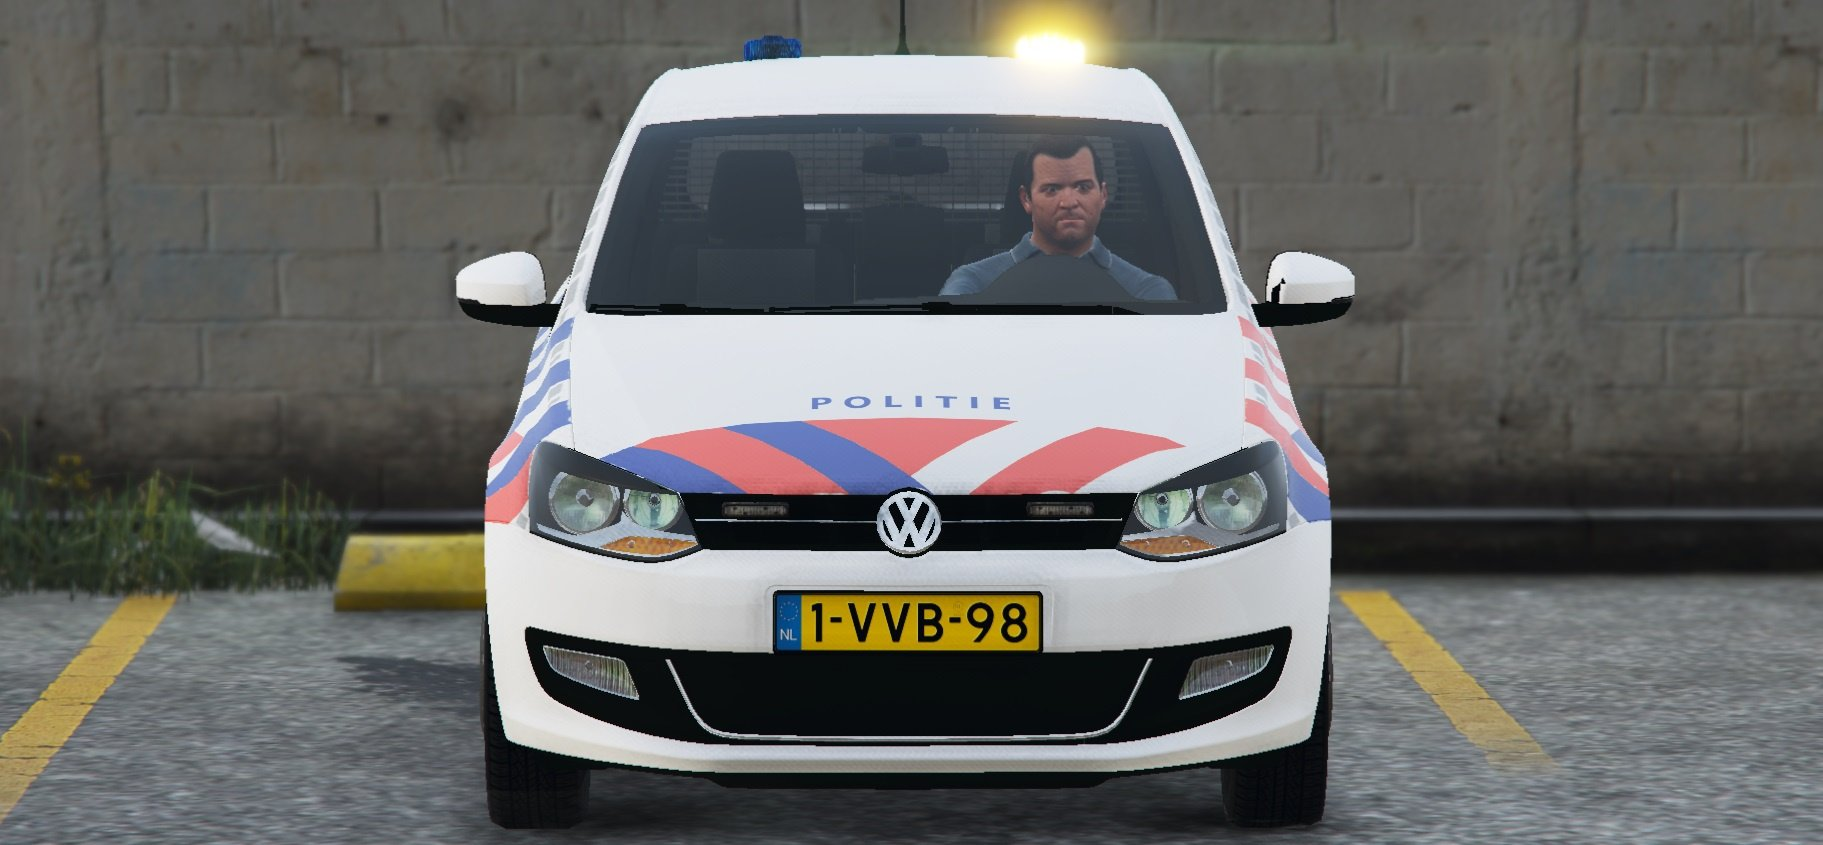 2011 volkswagen polo politie els new version gta5. Black Bedroom Furniture Sets. Home Design Ideas